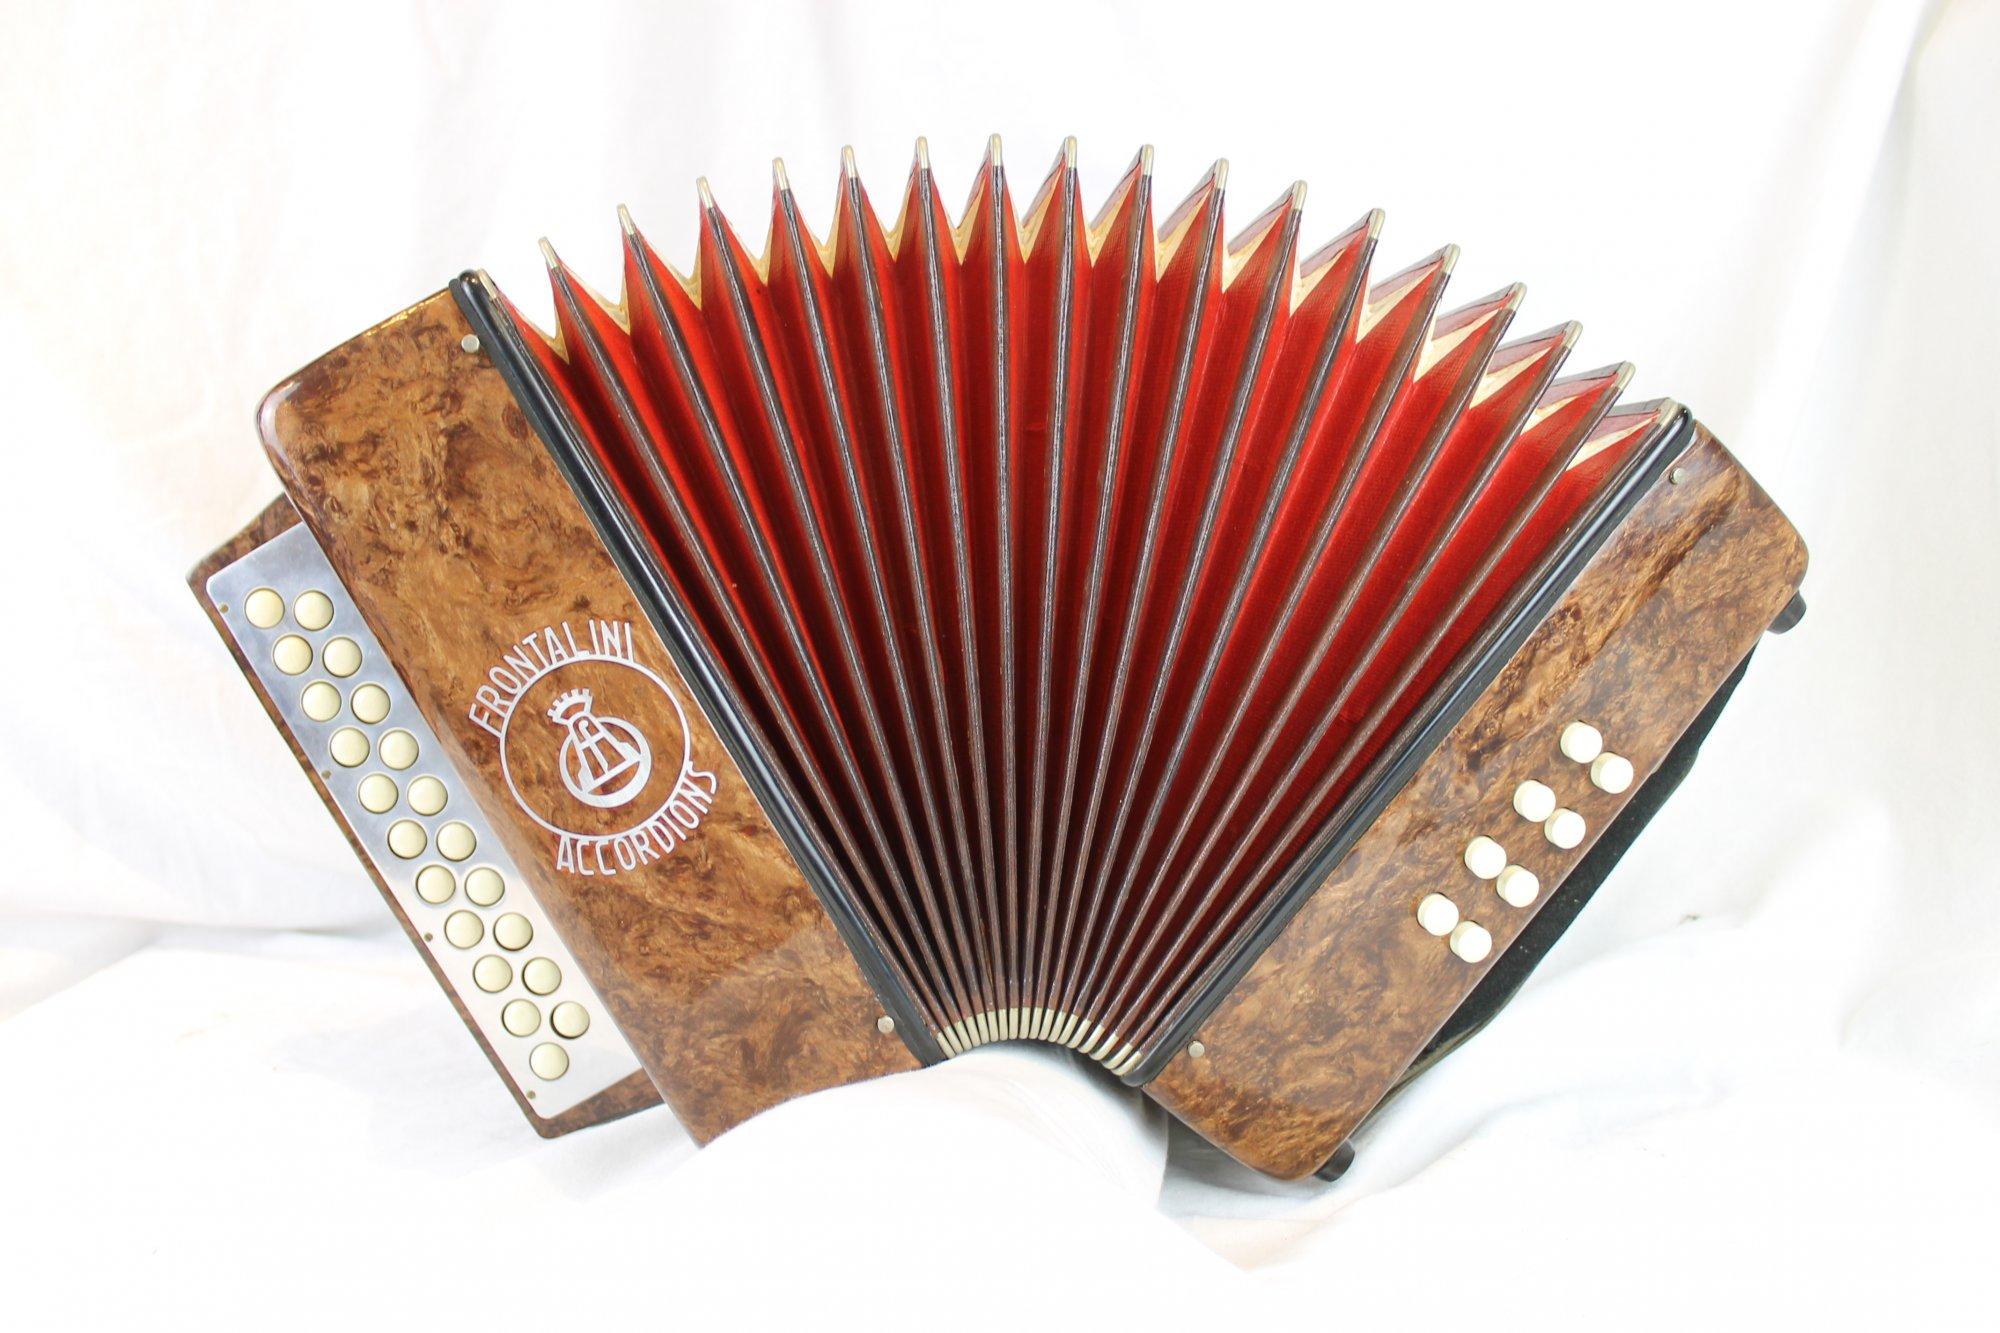 4894 - Brown Frontalini Diatonic Button Accordion BC MM 21 8